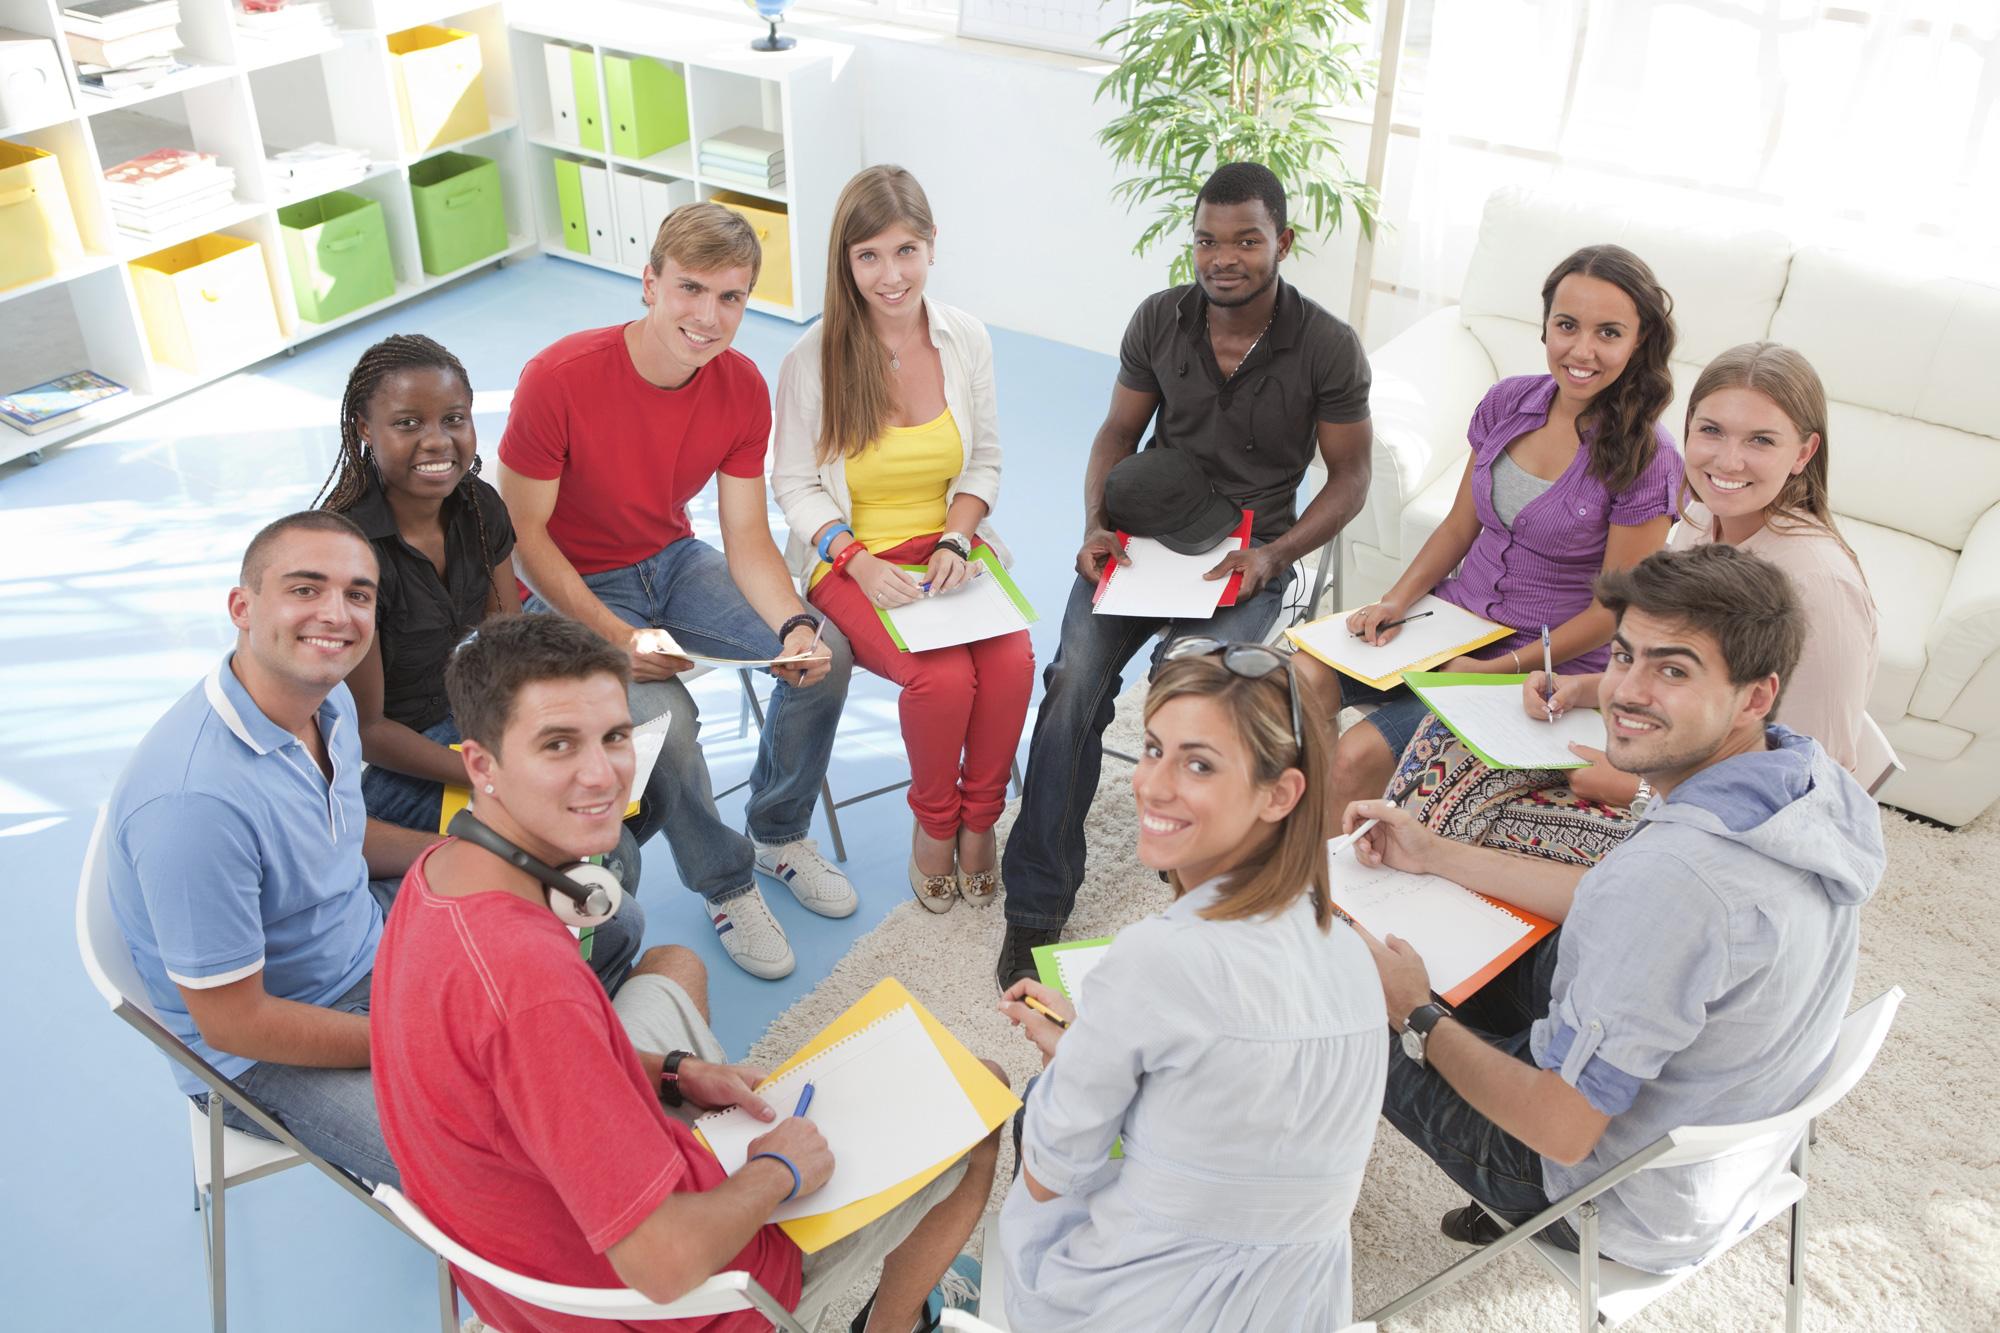 iStock 000021214814 XXXLarg - Intensive Revision Courses